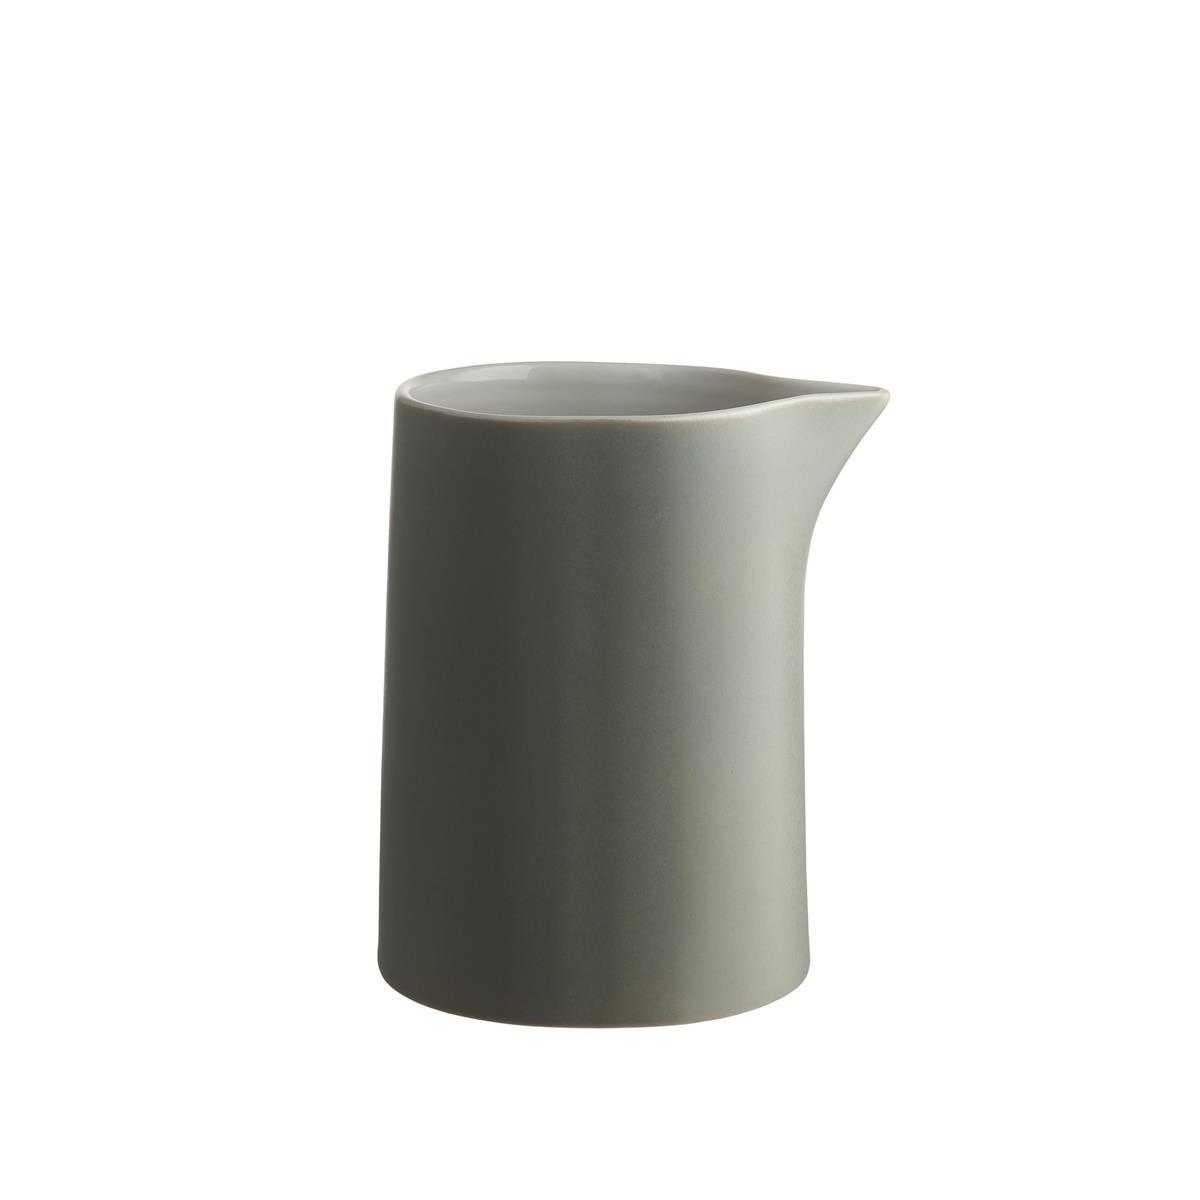 Alessi-Tonale Carafe in stoneware ceramic, Light Gray